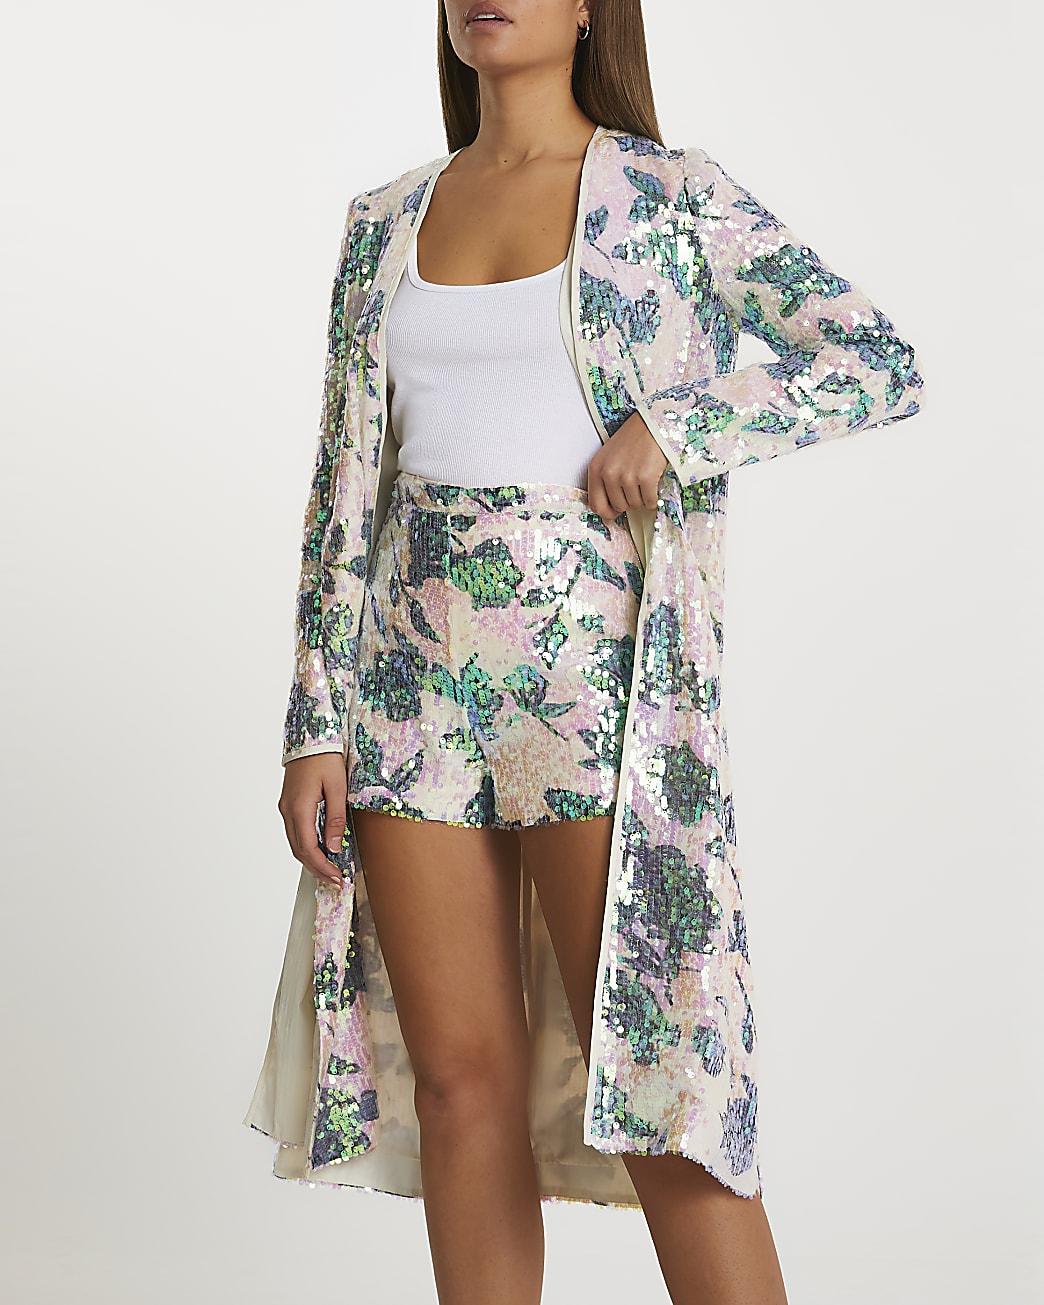 Pink floral sequin shorts